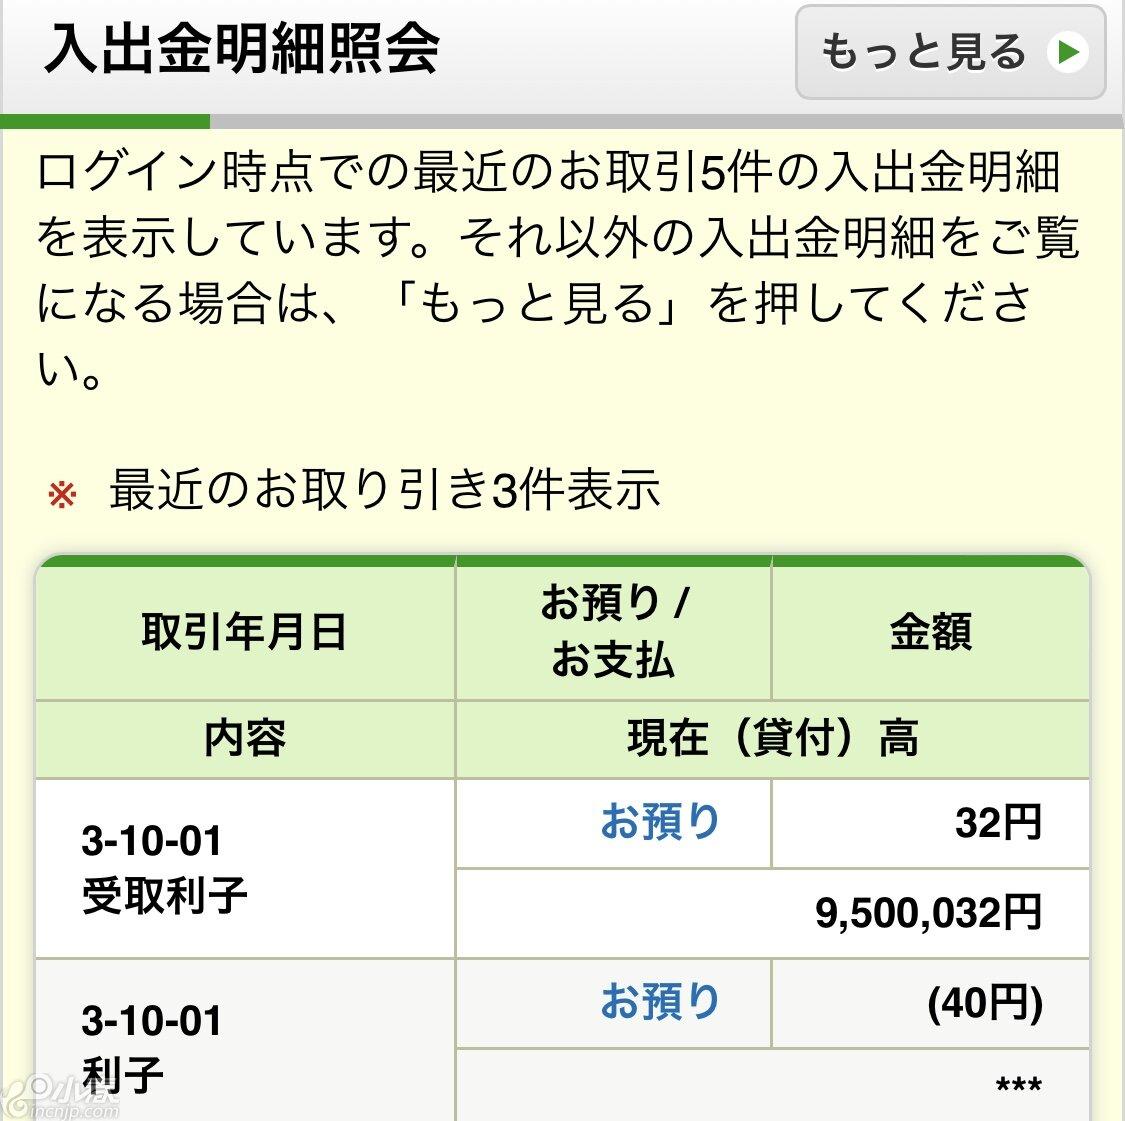 1794E6FA-53D8-4091-B1BA-A988219D302C.jpeg